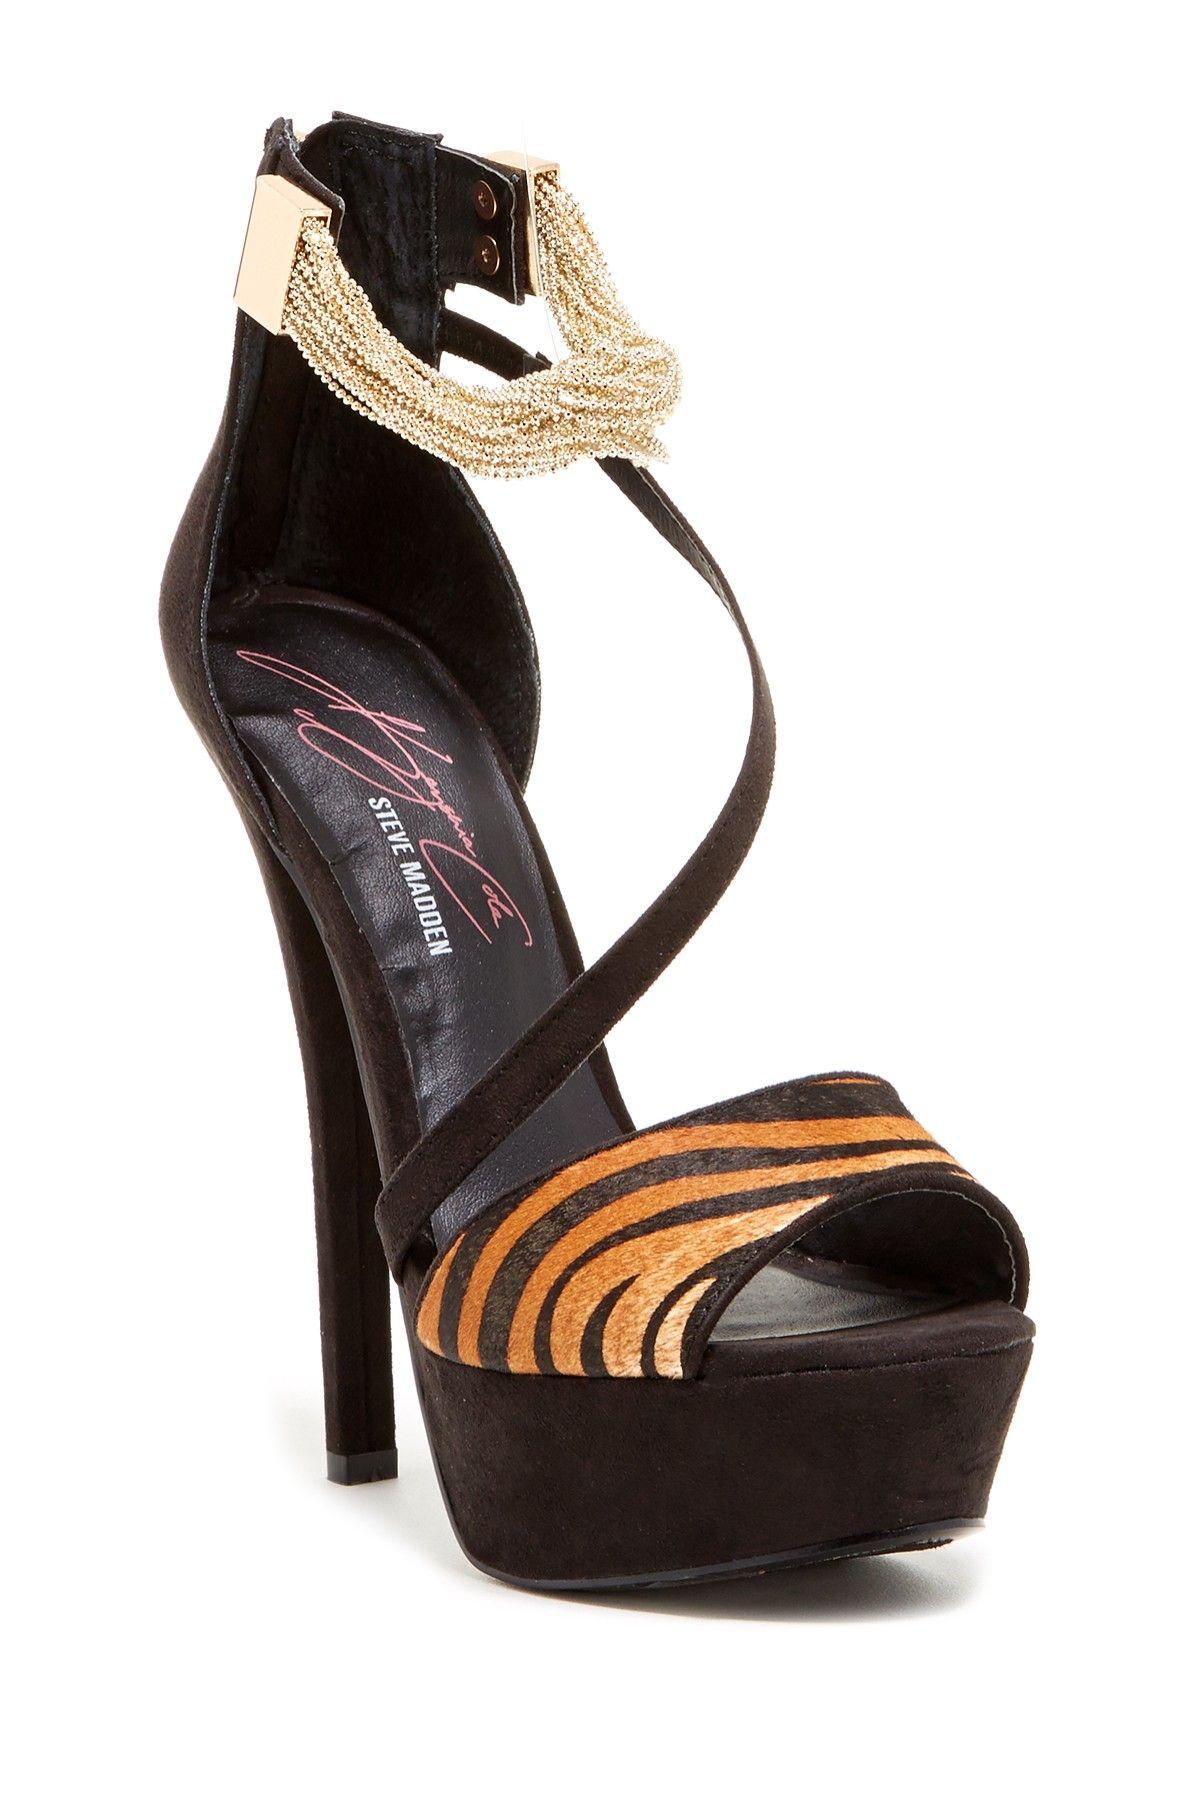 3ddb9076b62 Keyshia cole for steve madden fresh platform sandal steve madden on  nordstrom rack jpg 1200x1800 Keyshia